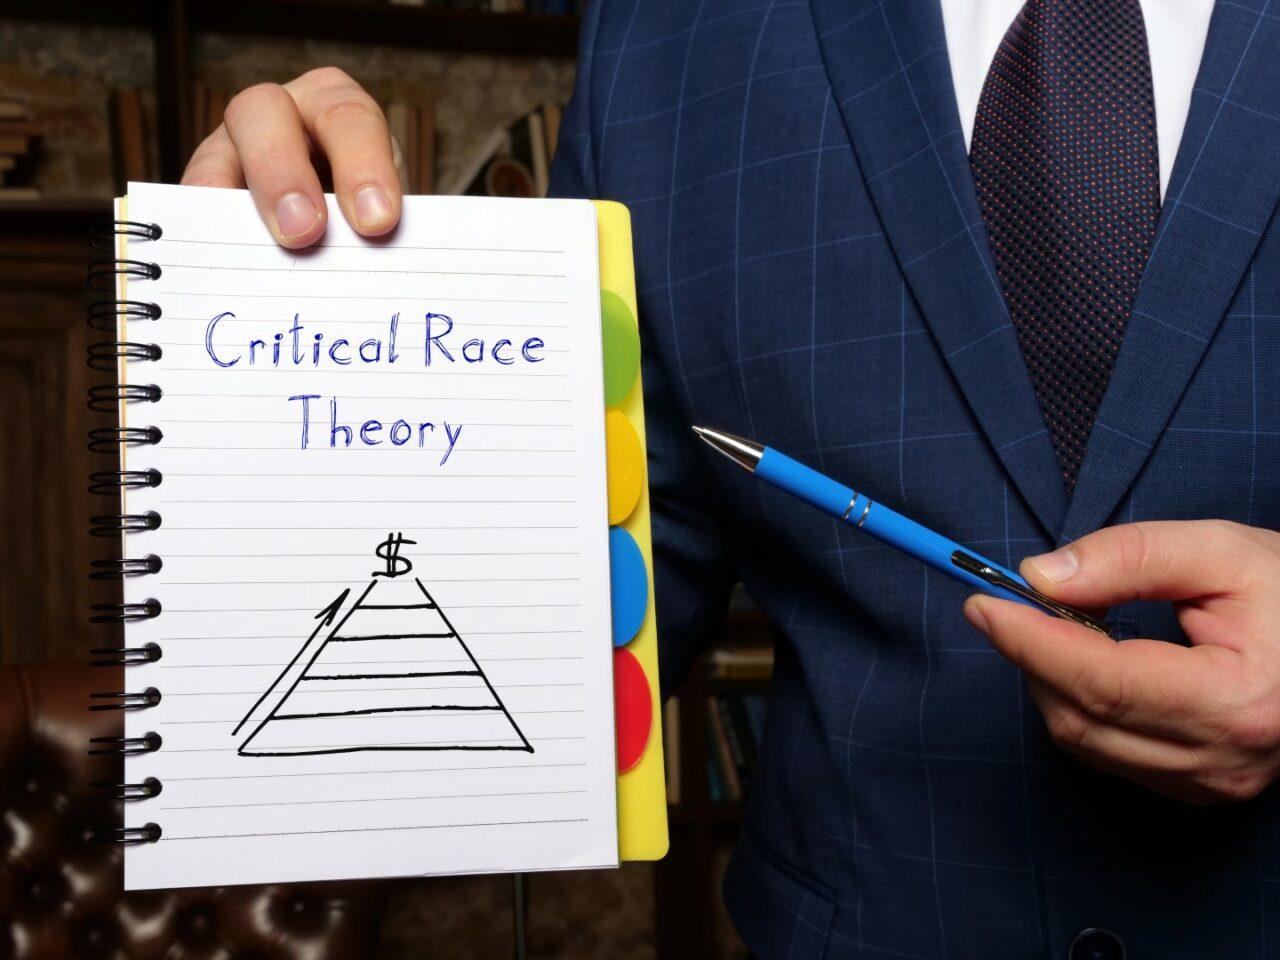 critical-race-theroy-Large-1280x960.jpeg